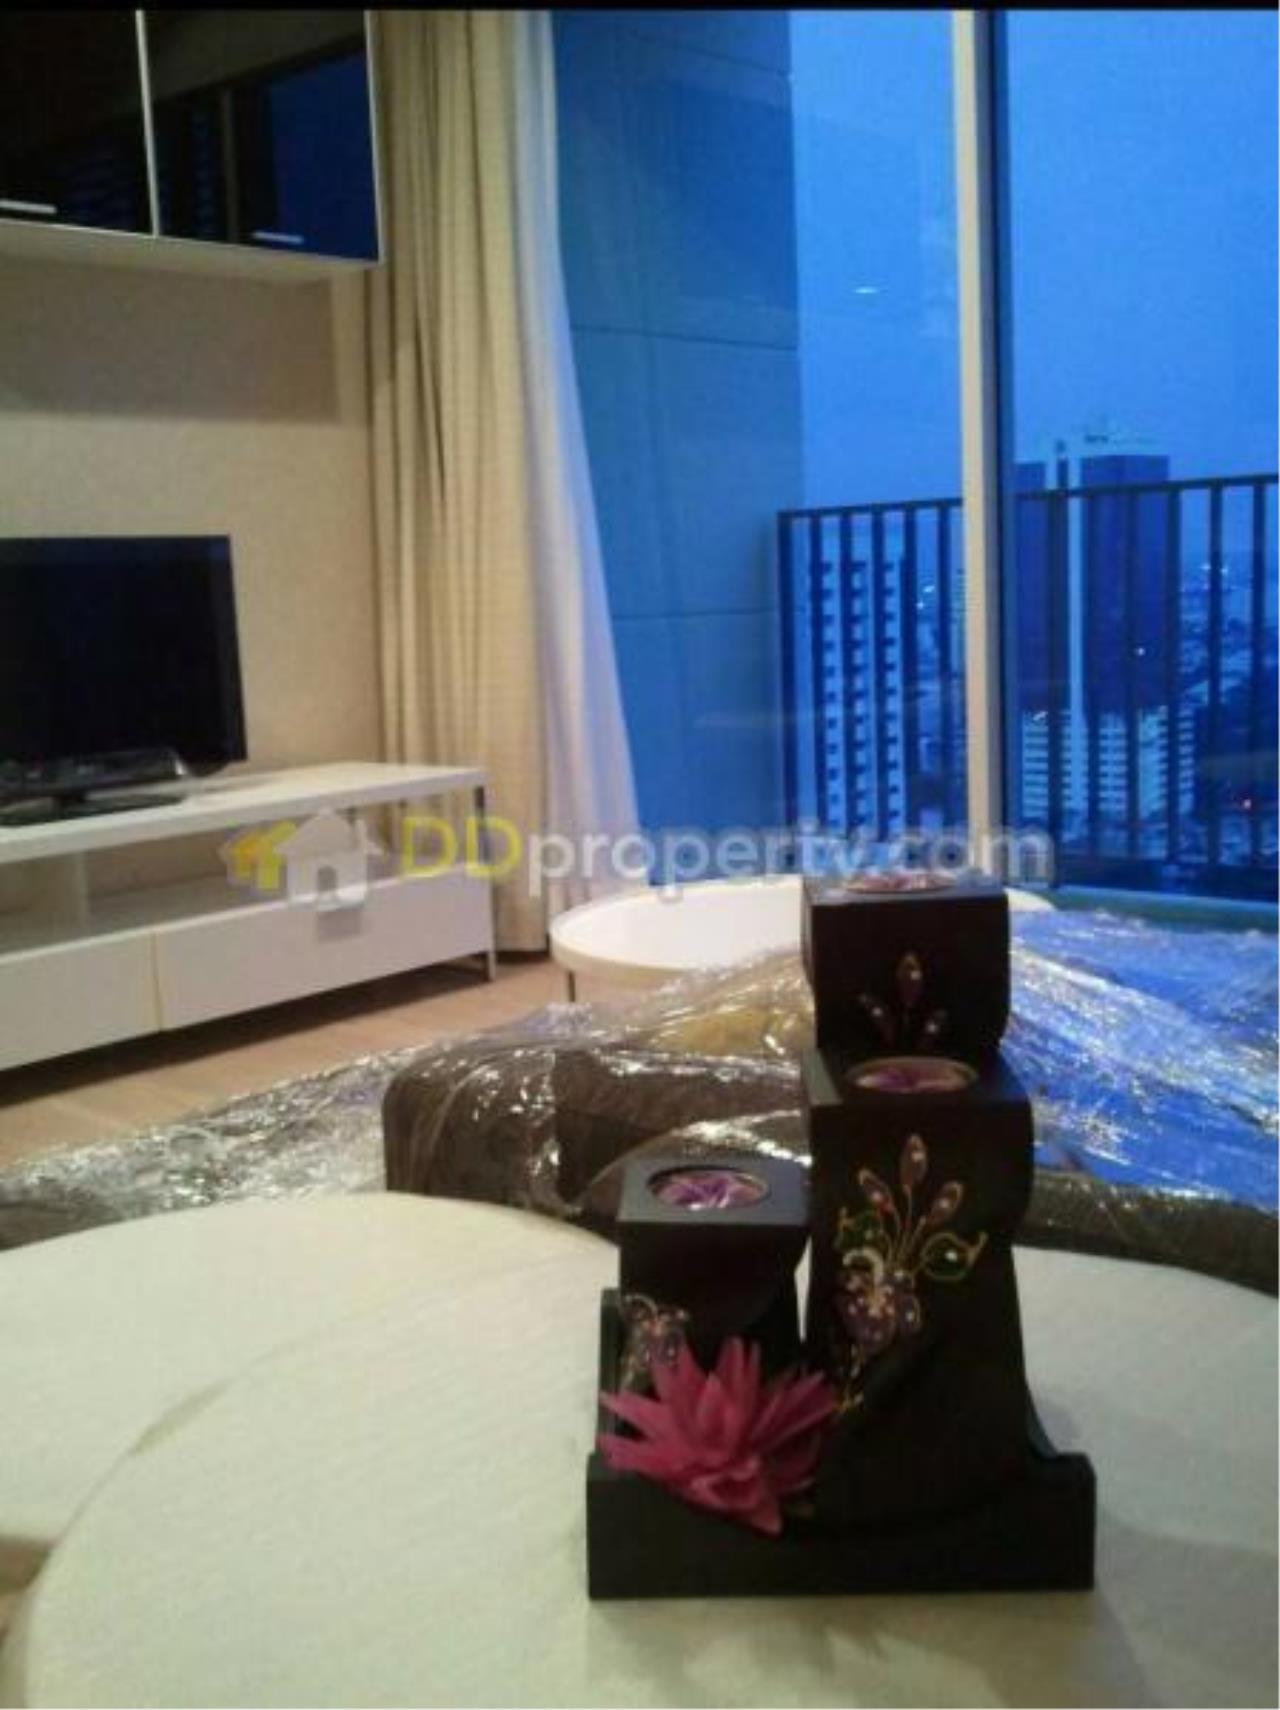 Quality Life Property Agency's  *****Rent****Sukhumvit Condominium BTS Thonglor 1